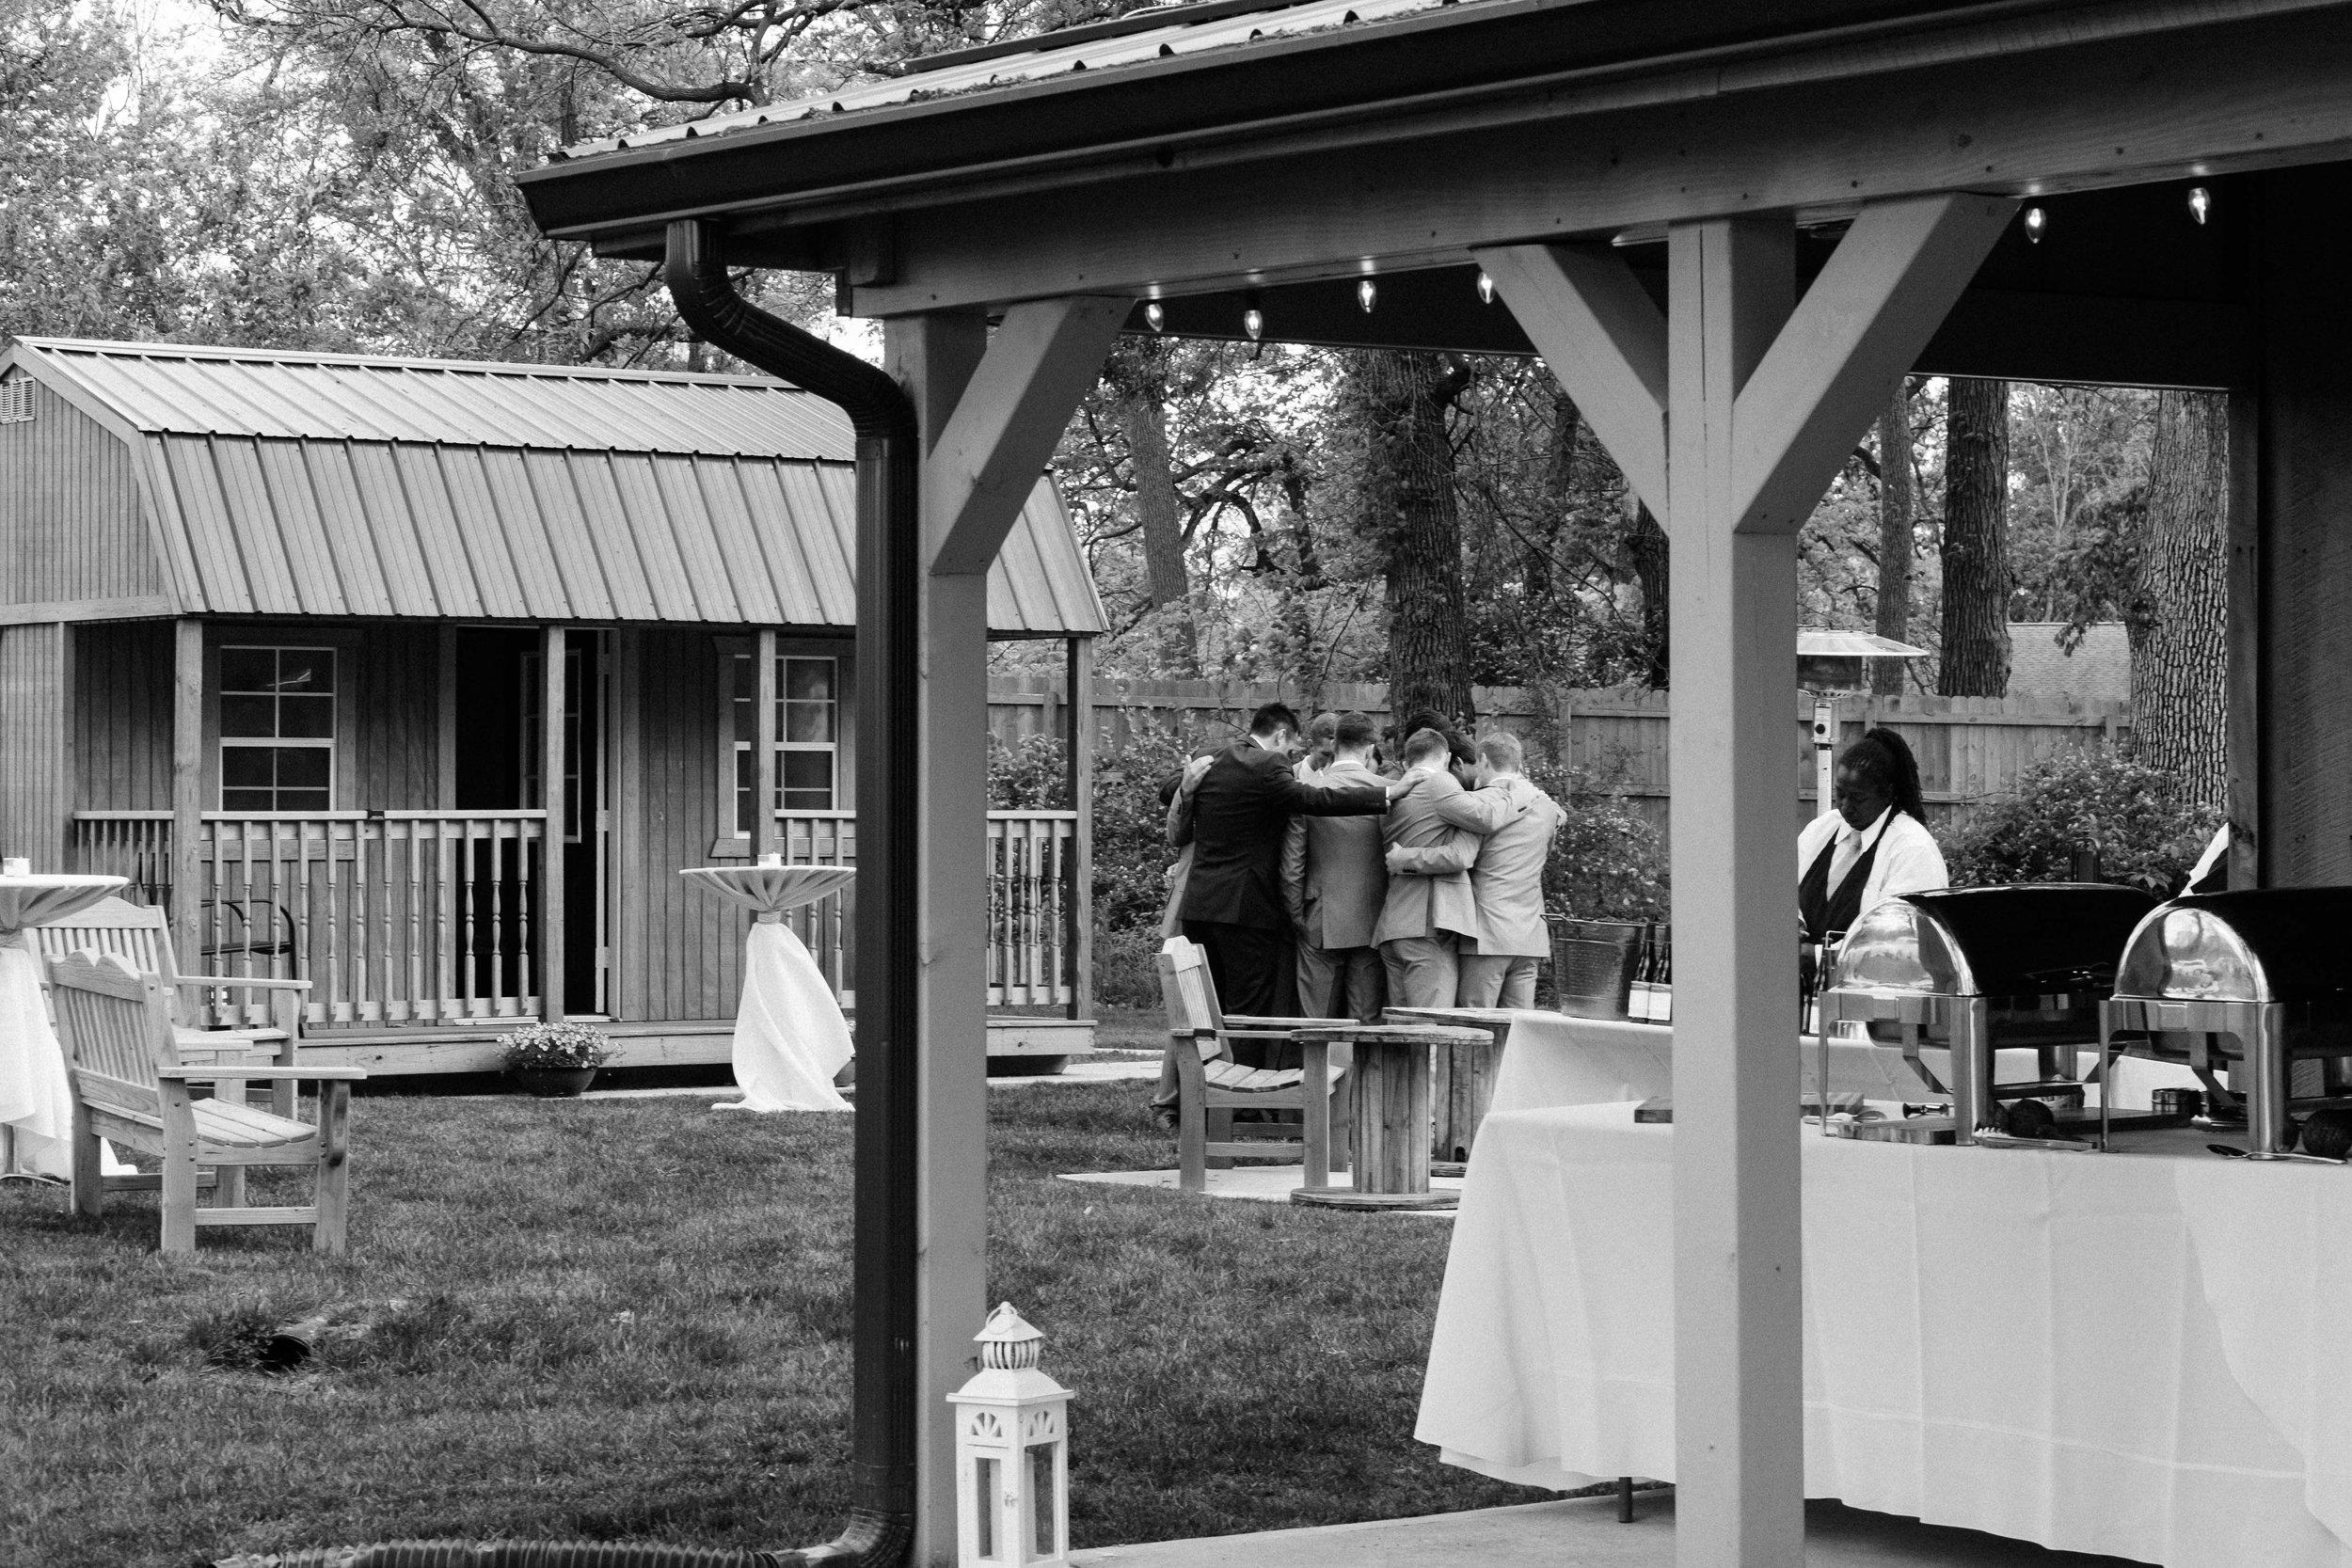 Steph-Ben-Blog-Indianapolis-Wedding-33.jpg